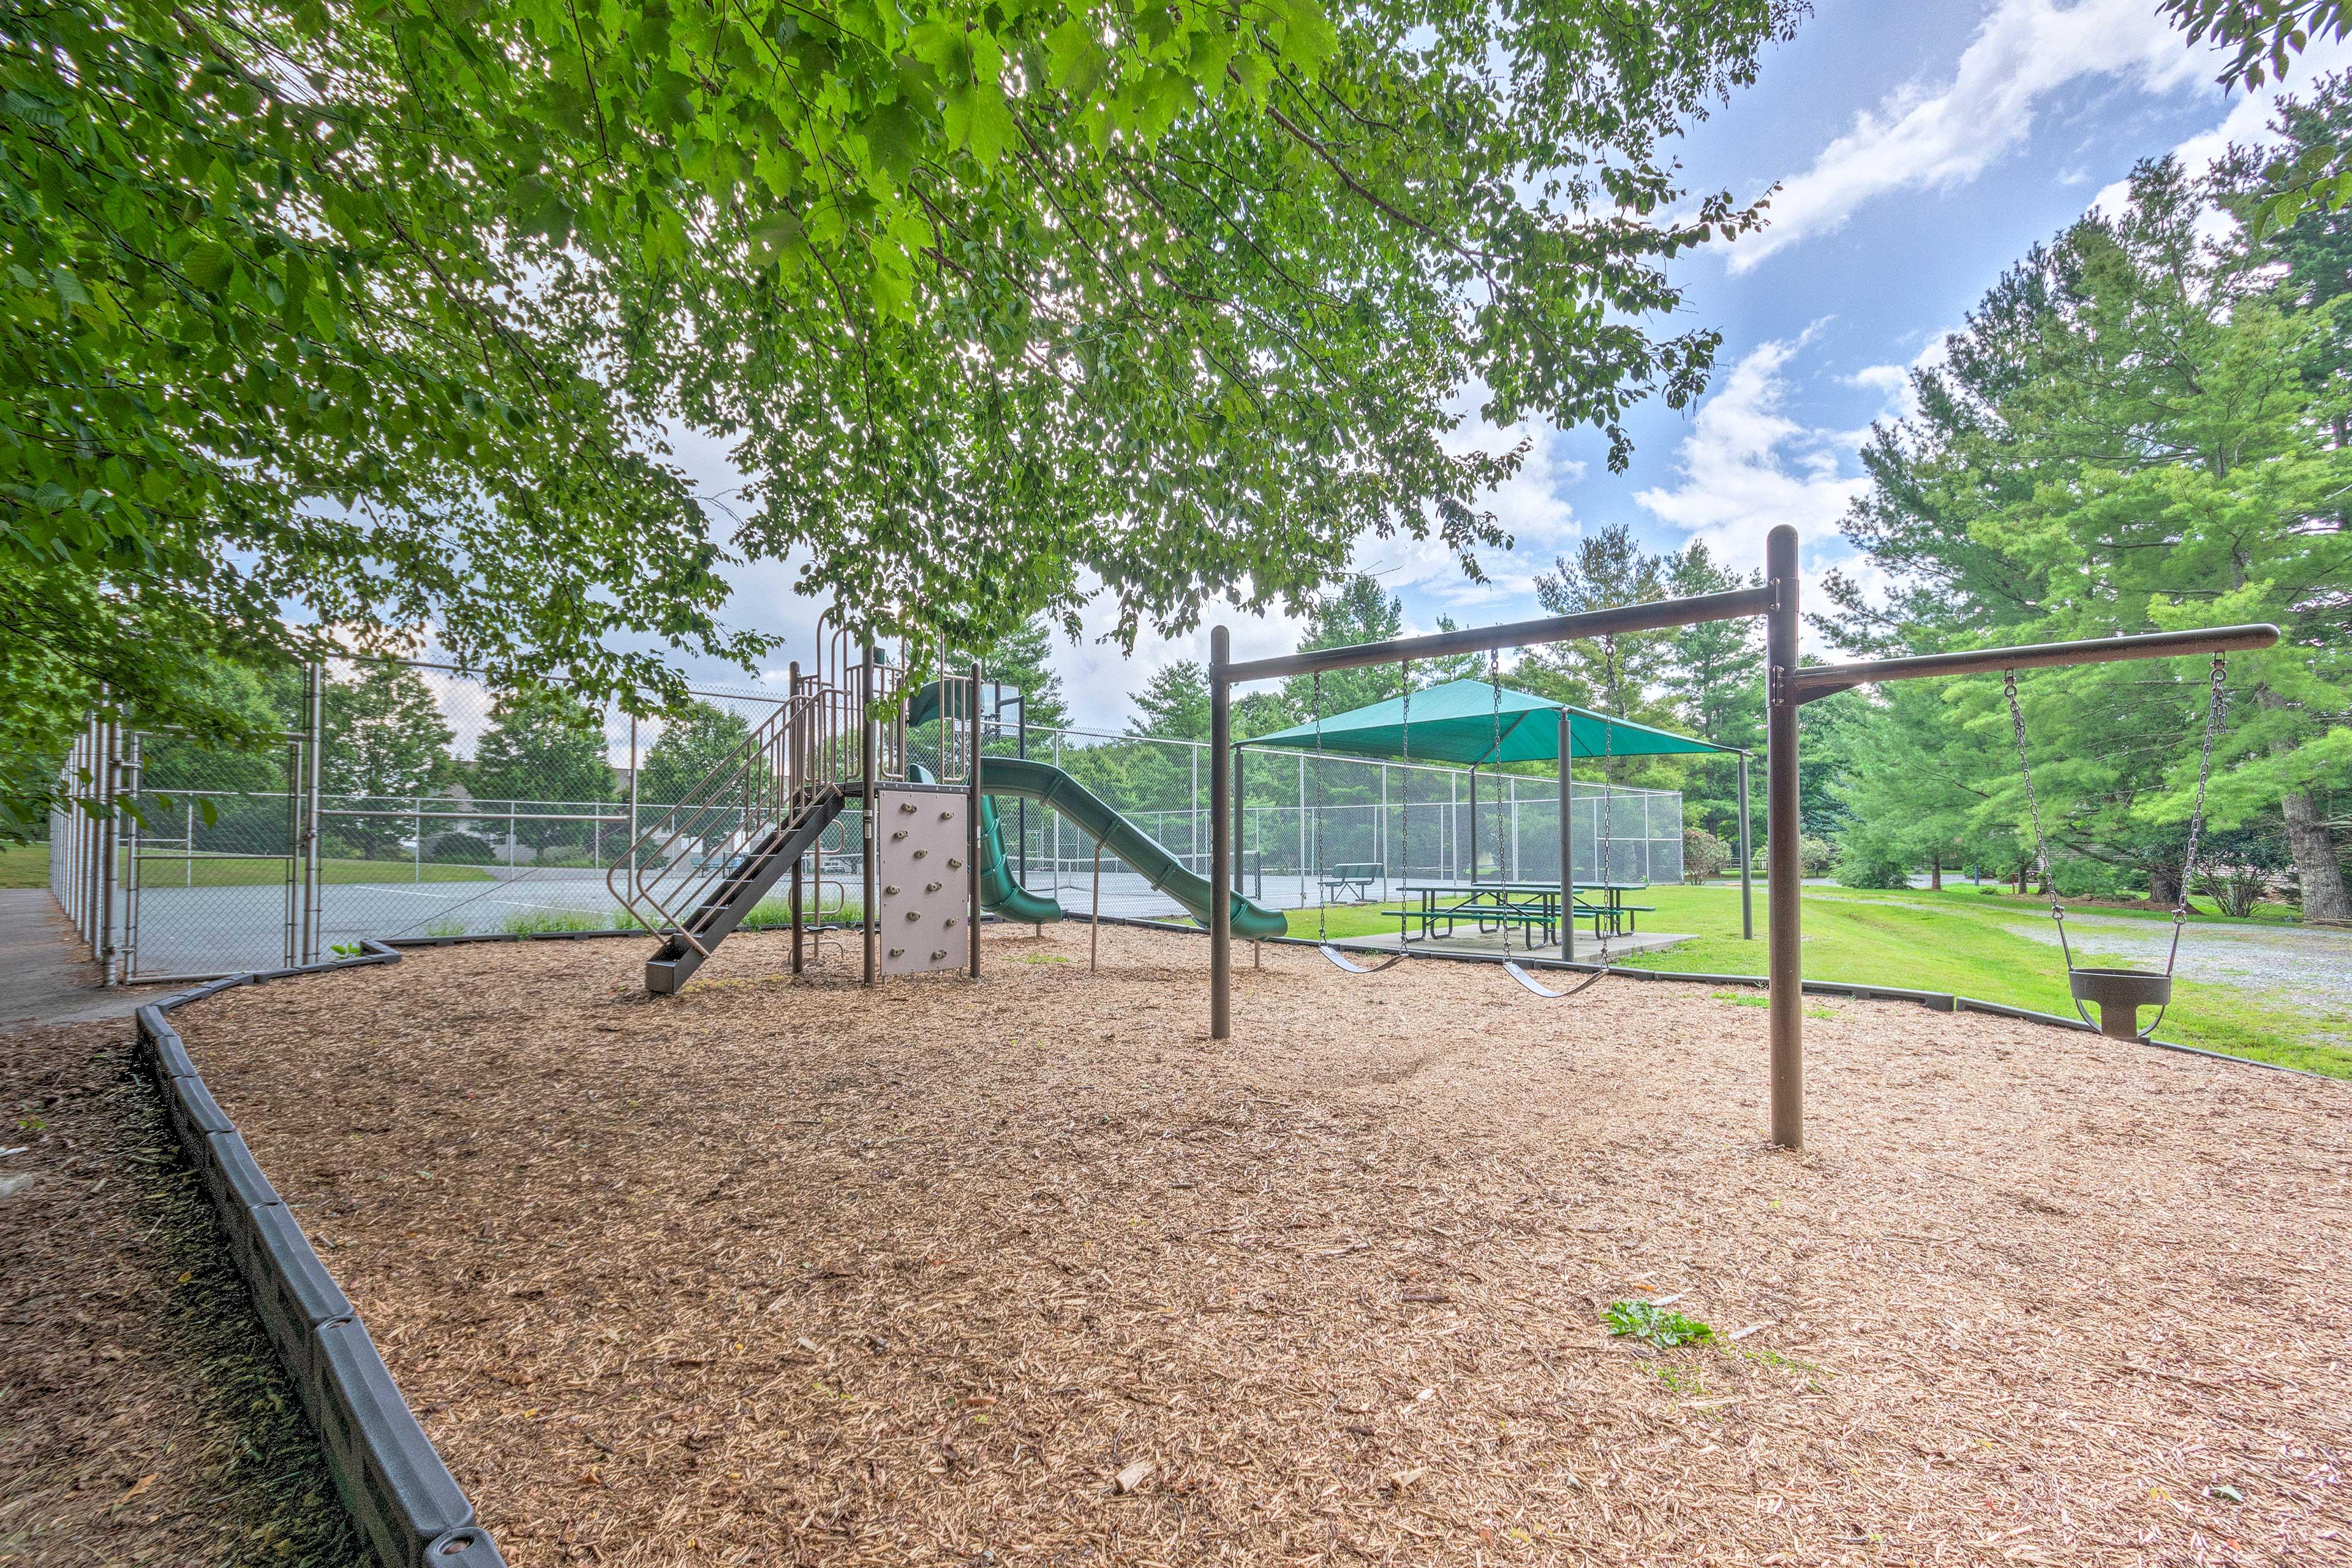 Hawks Peak South Community   Playground